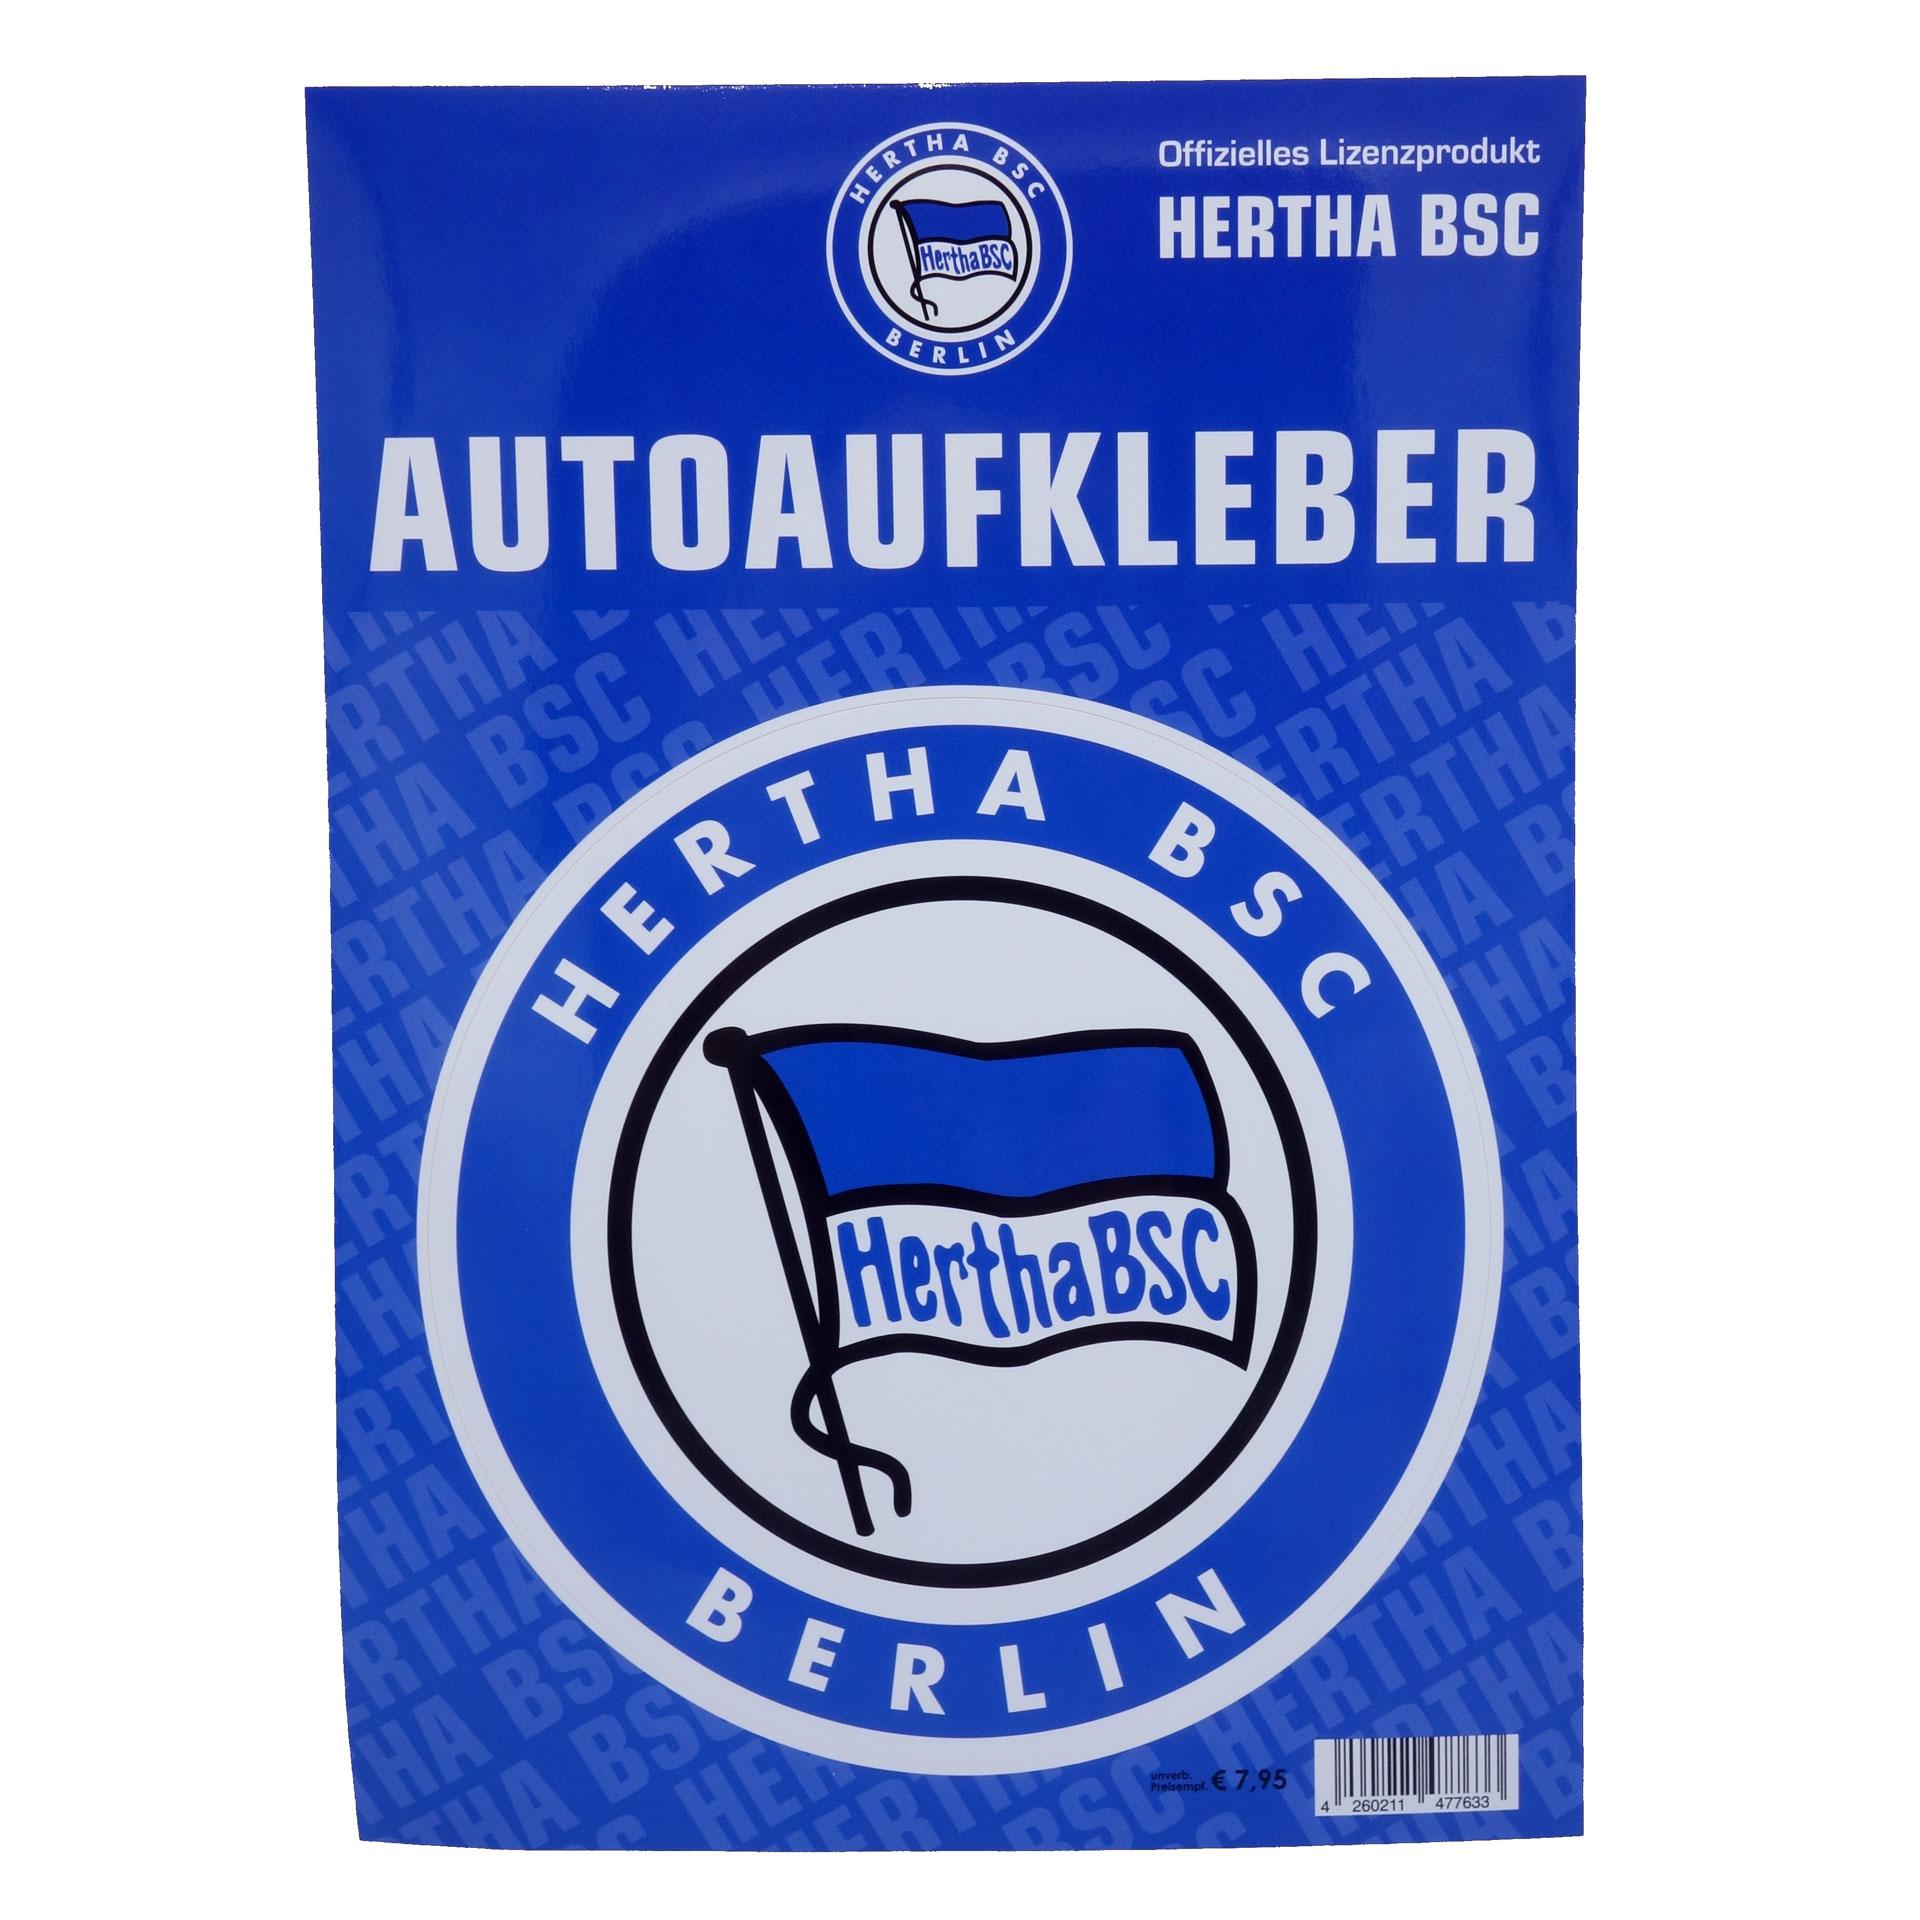 Hertha BSC Autoaufkleber Groß